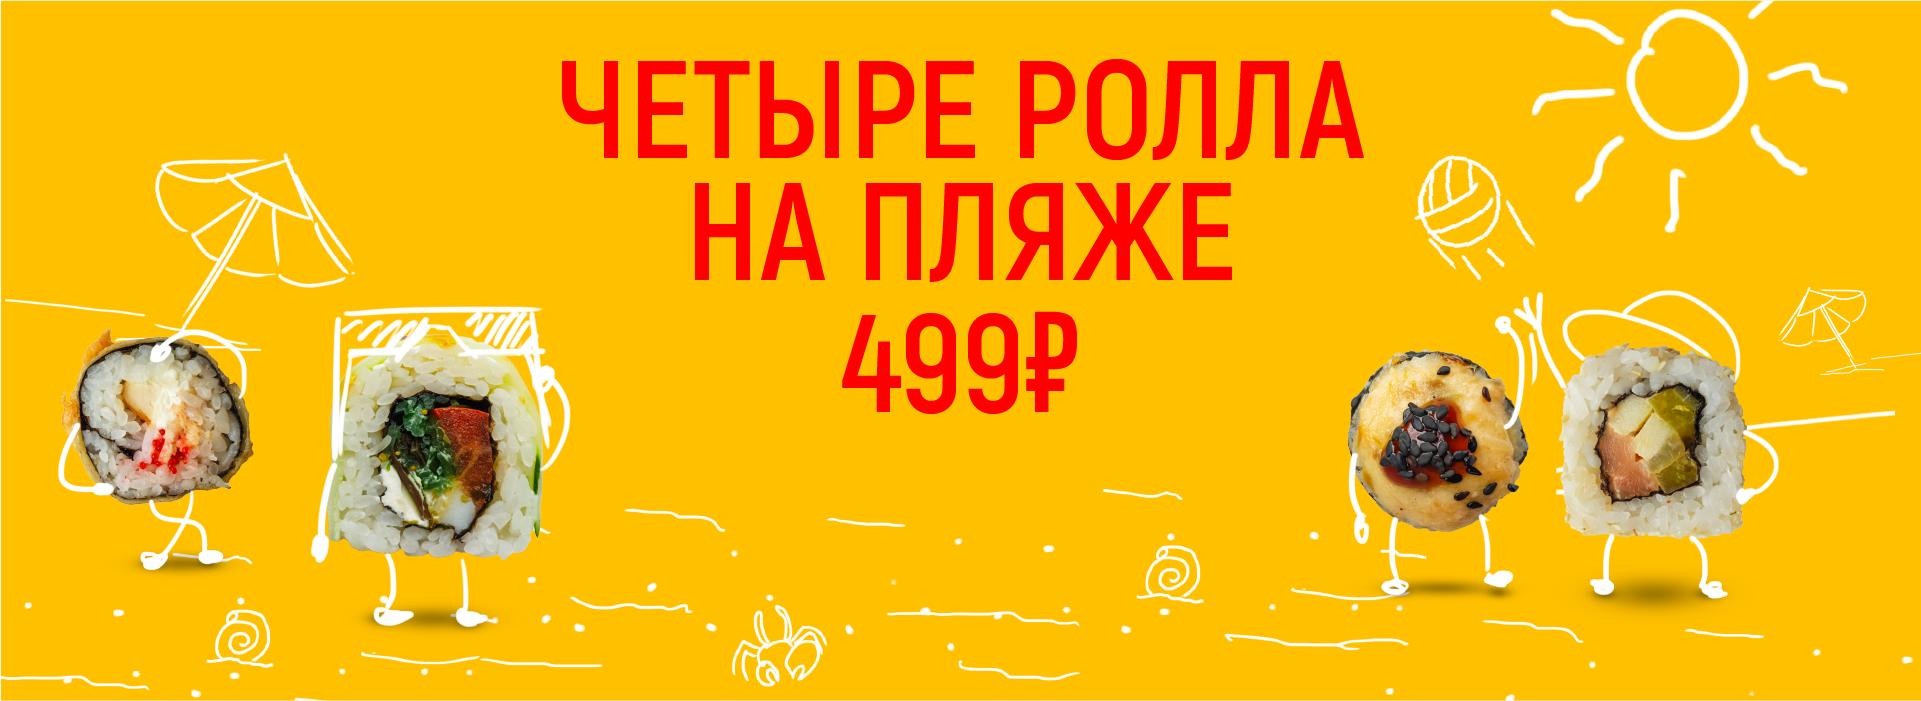 280519_-_Roly_za_499_Slider_kopia